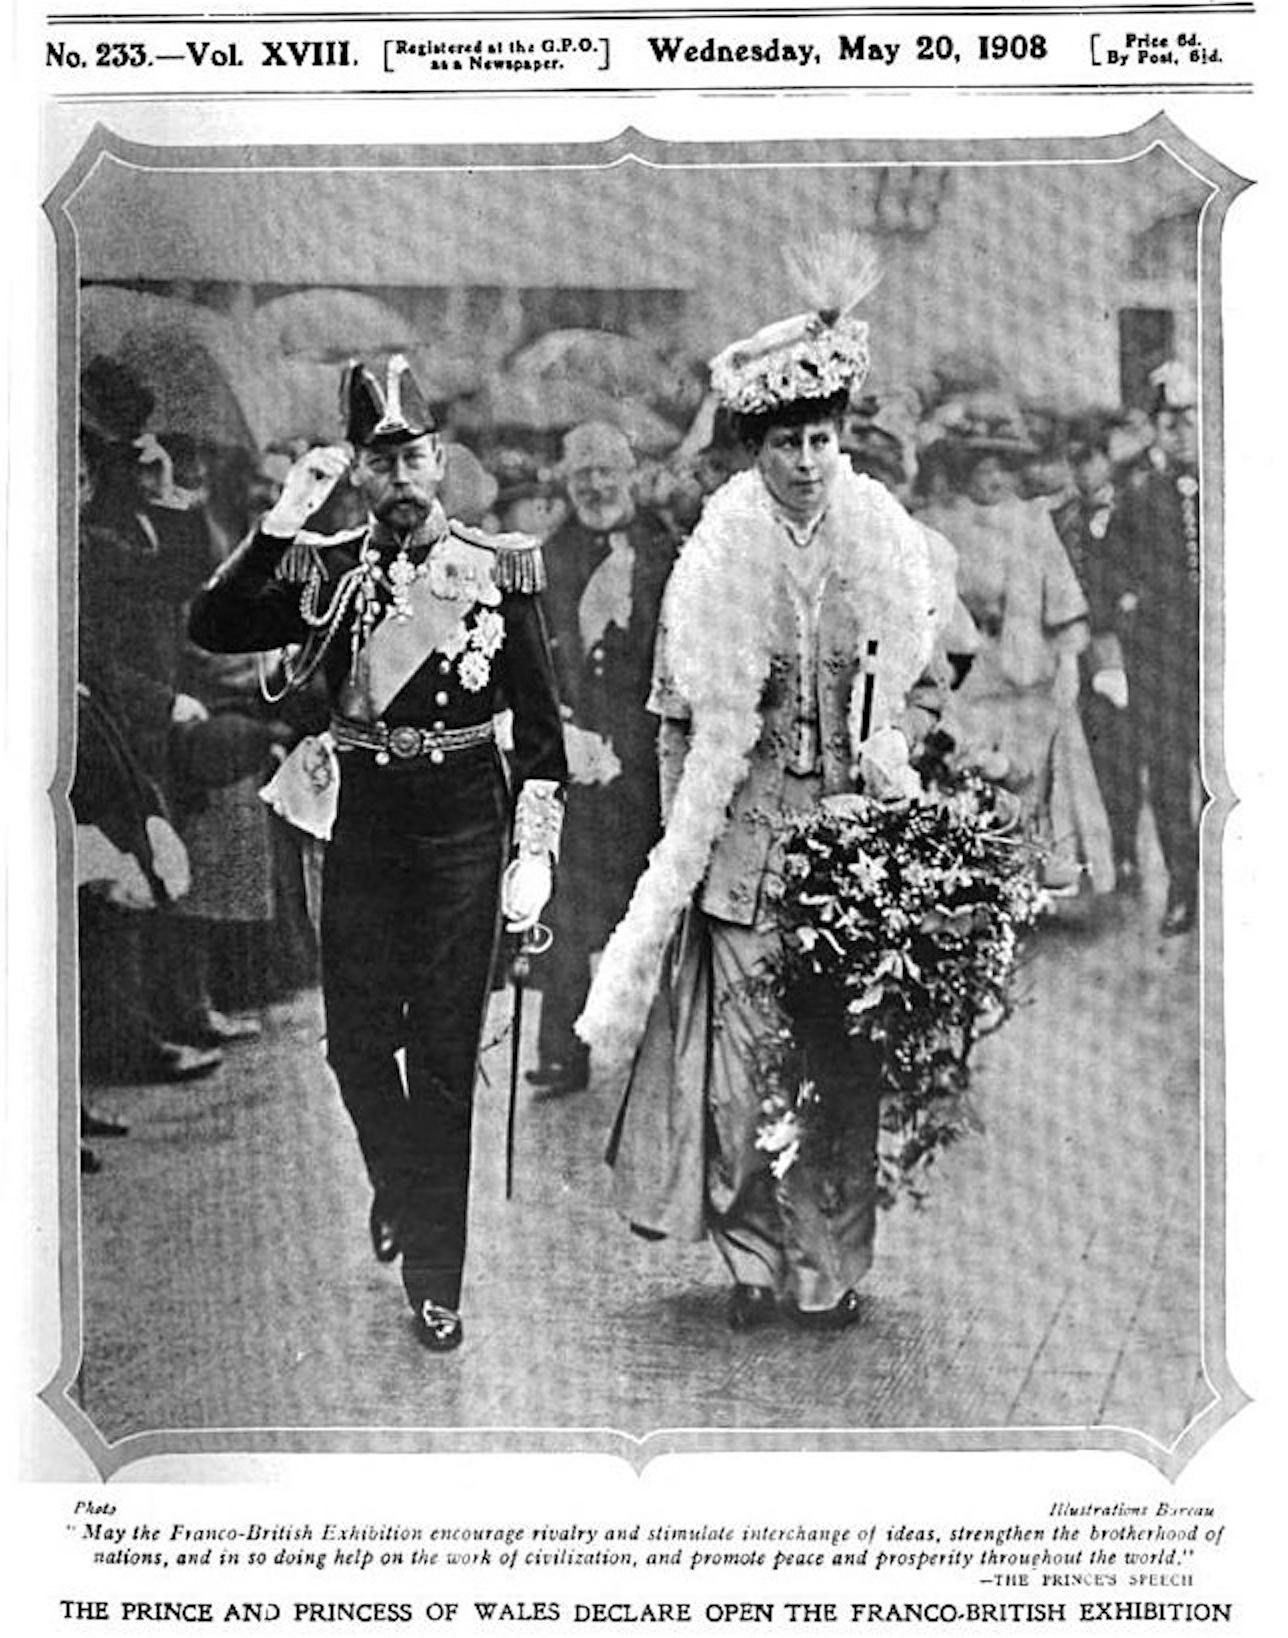 1908 Prince And Princess Of Wales Open Franco British